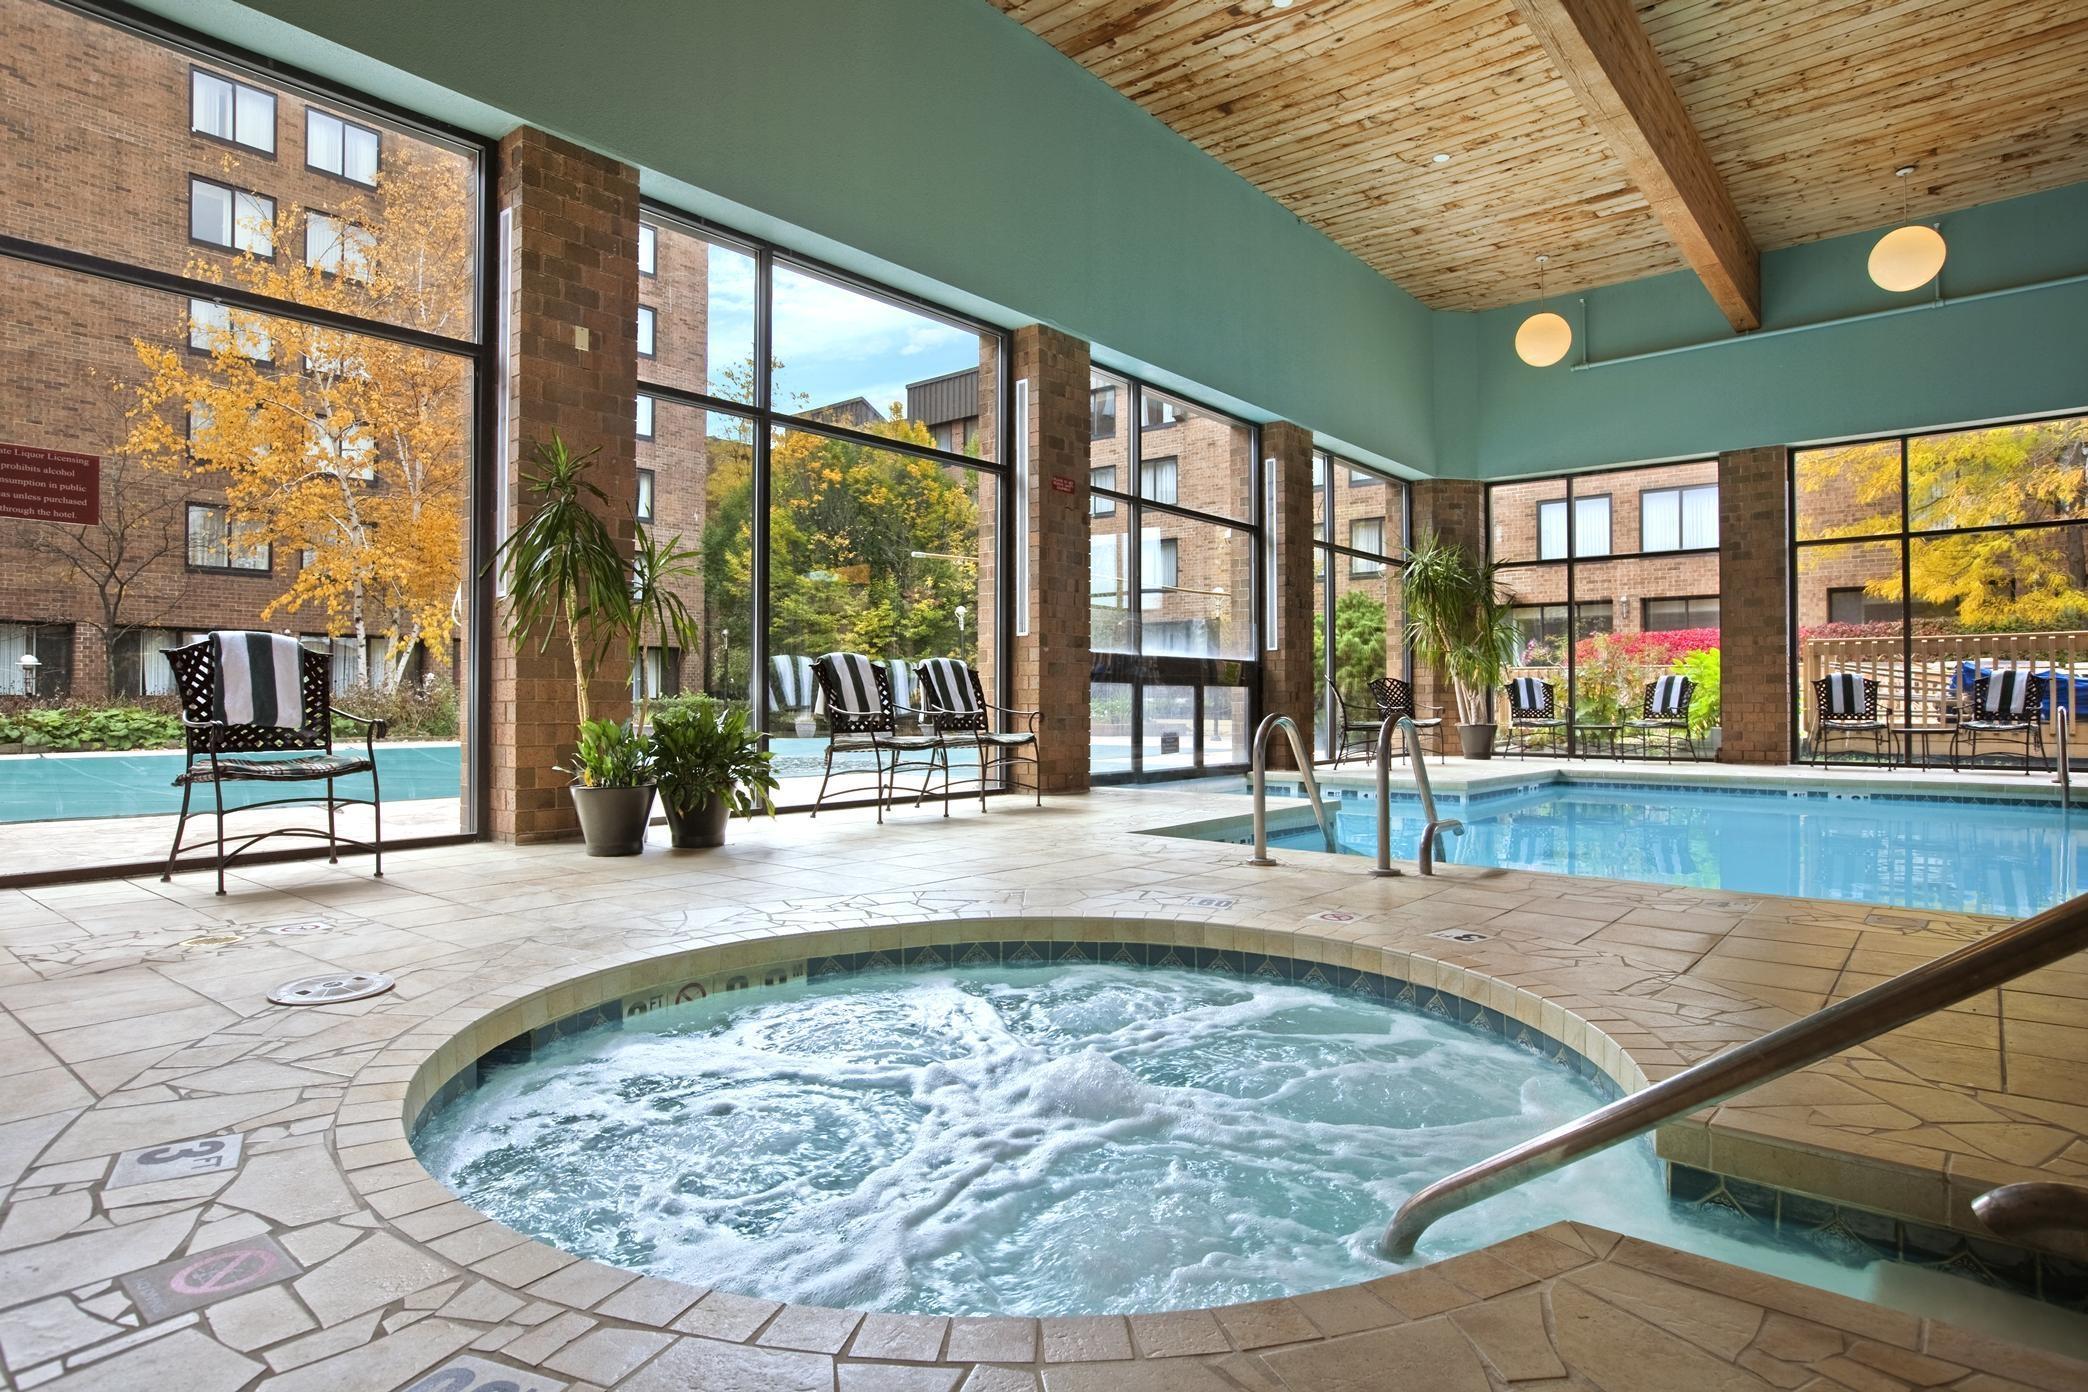 Doubletree By Hilton Hotel Cleveland East Beachwood